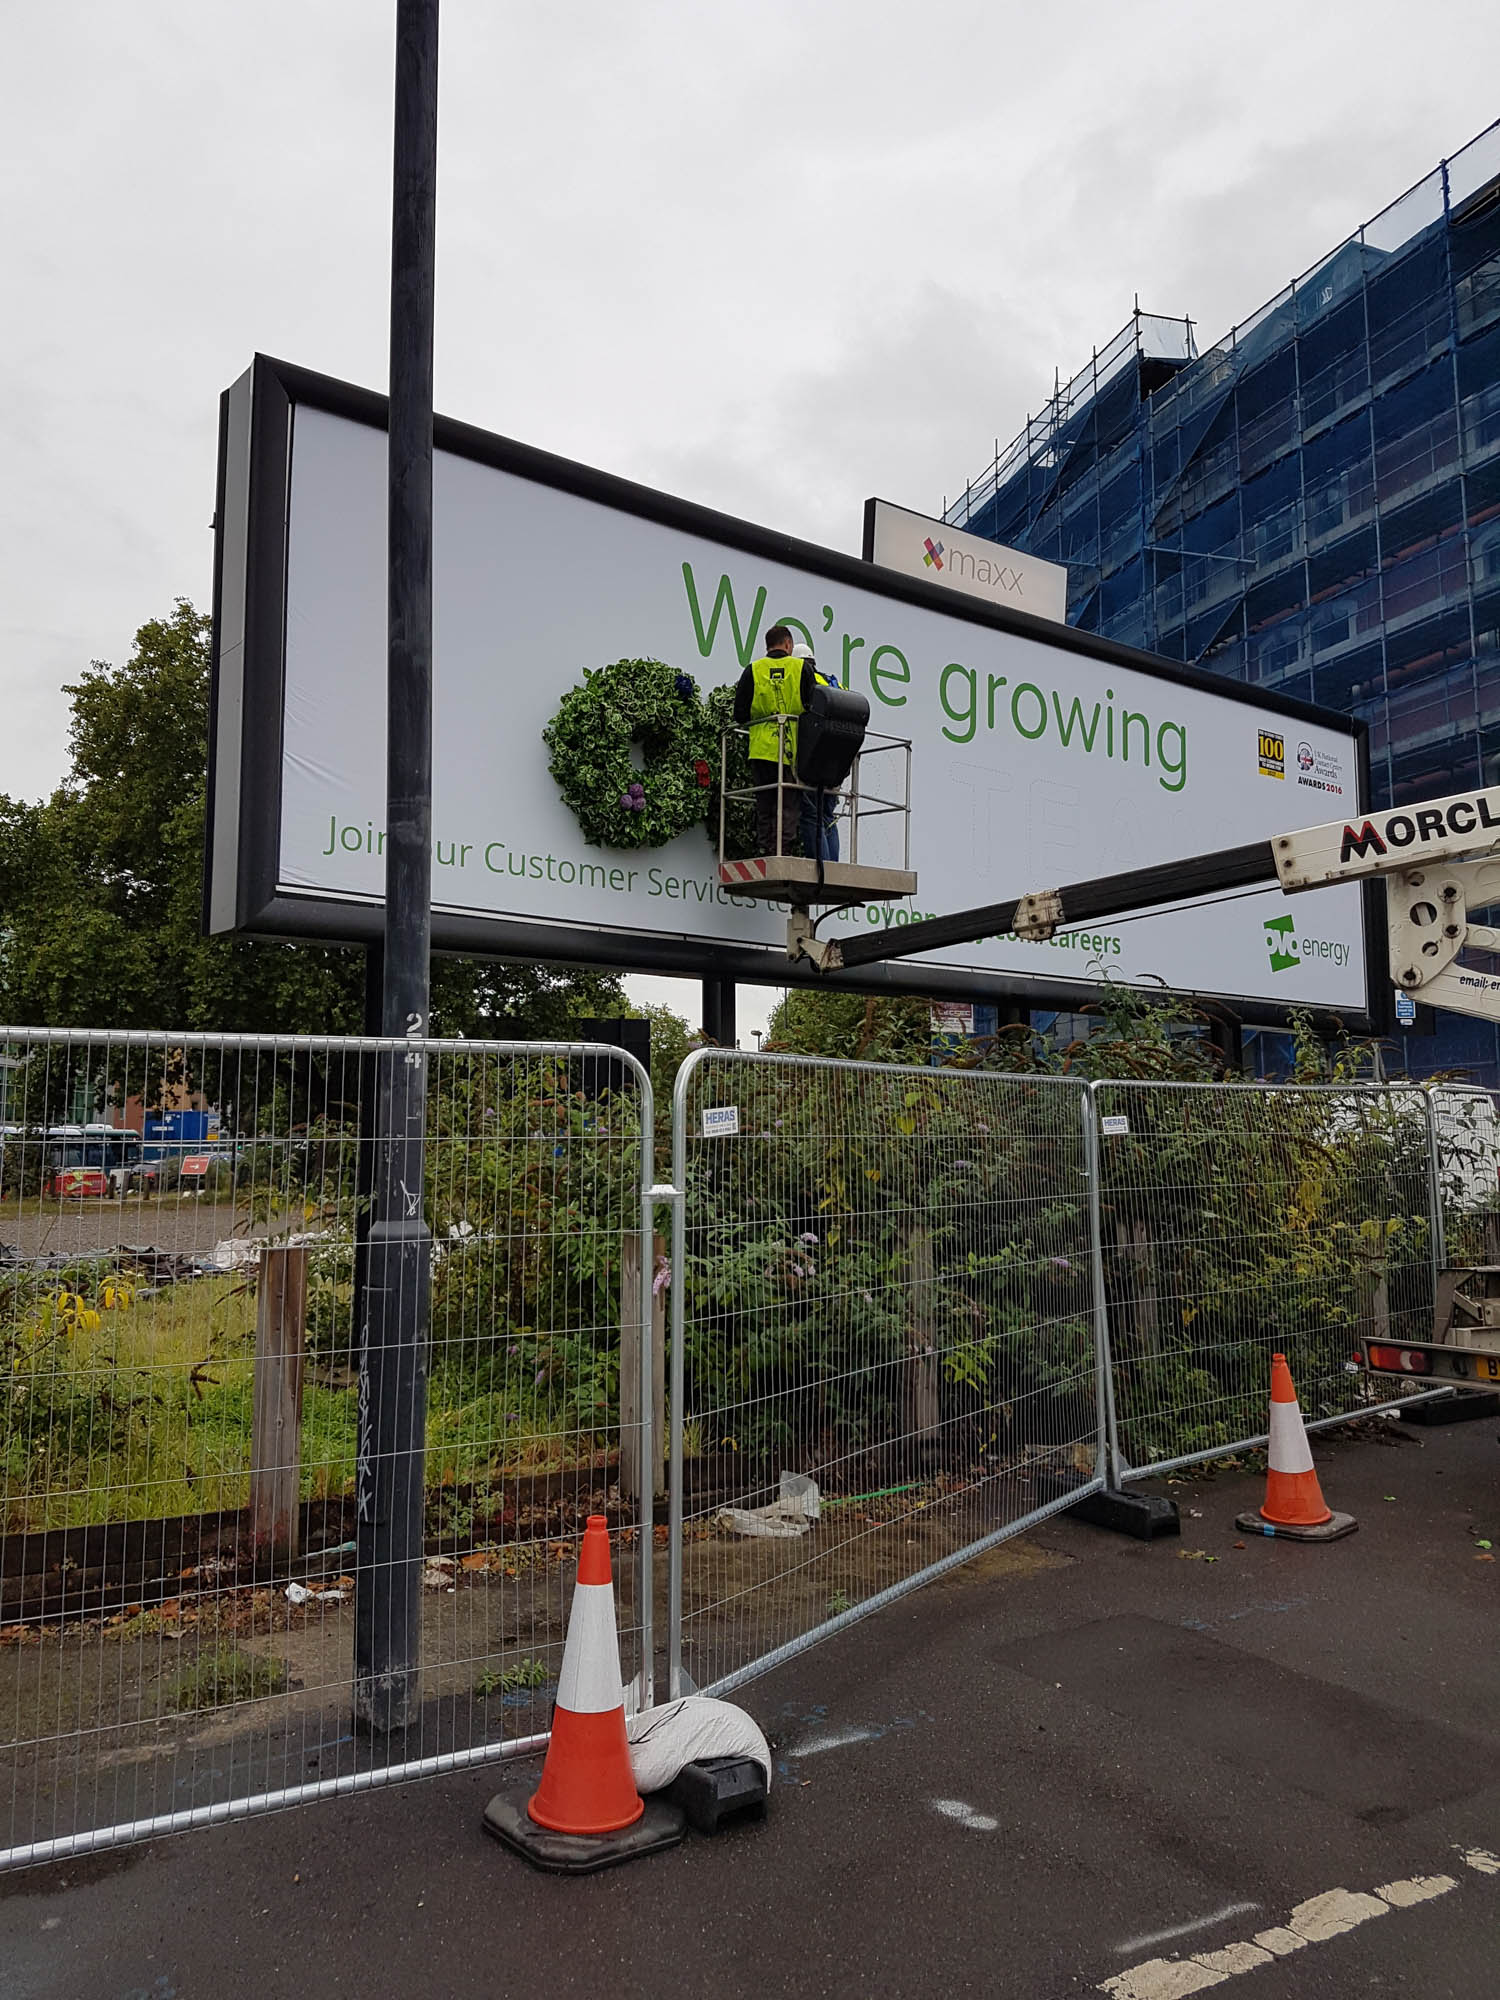 thirty-three-exterior-plant-display-billboard-mosswall-bespoke-custom-bristol-plantcare-ovo-energy-image-2